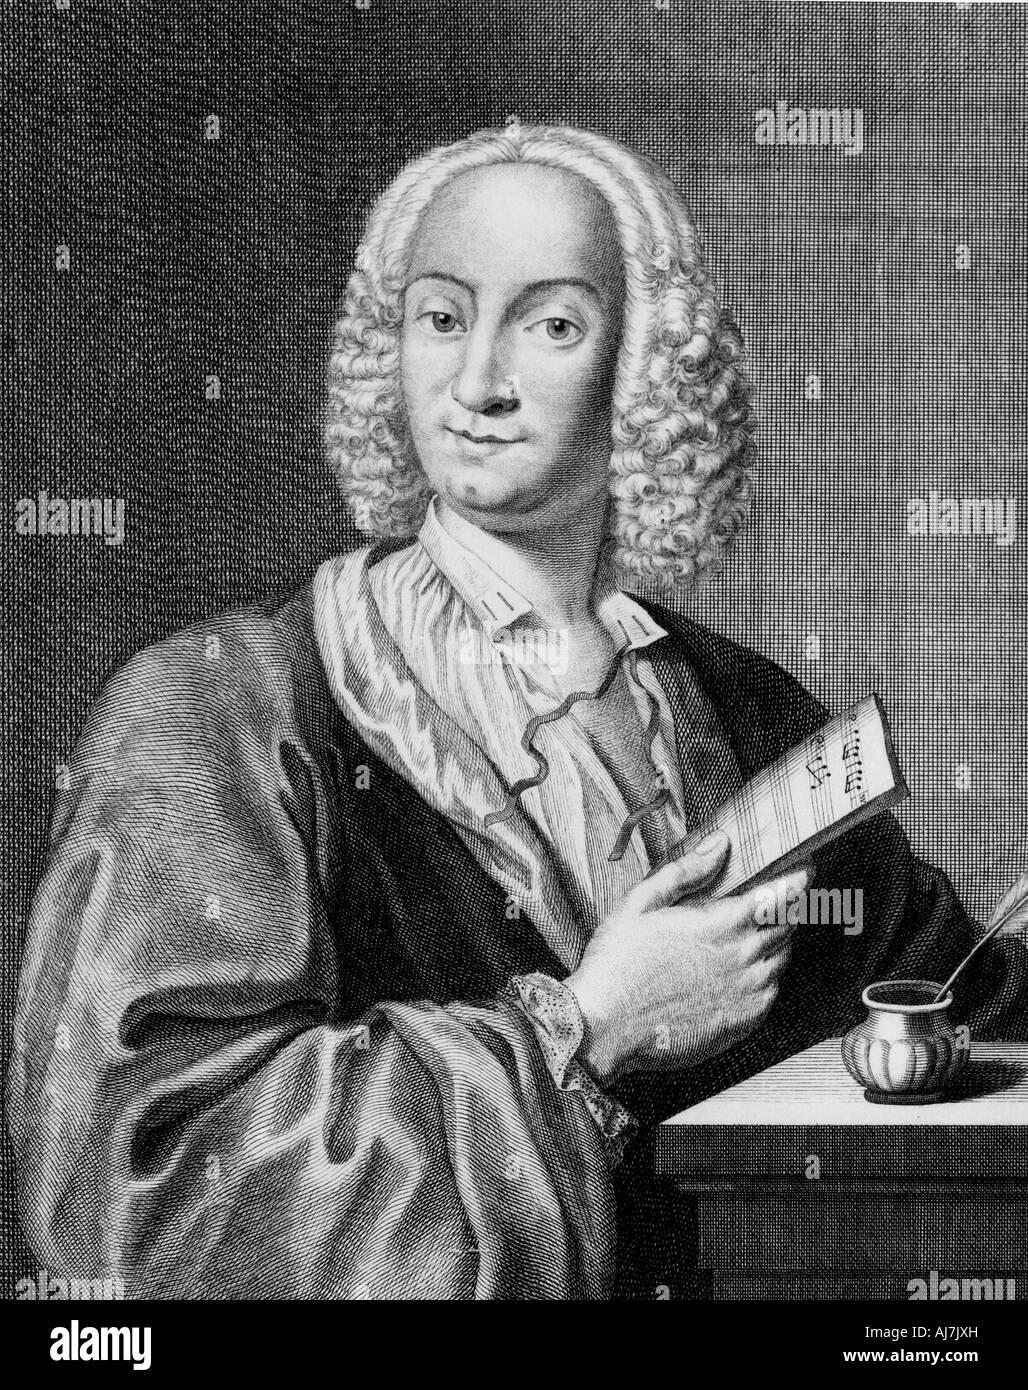 ANTONIO VIVALDI  Italian composer and violinist 1678 to 1741 - Stock Image